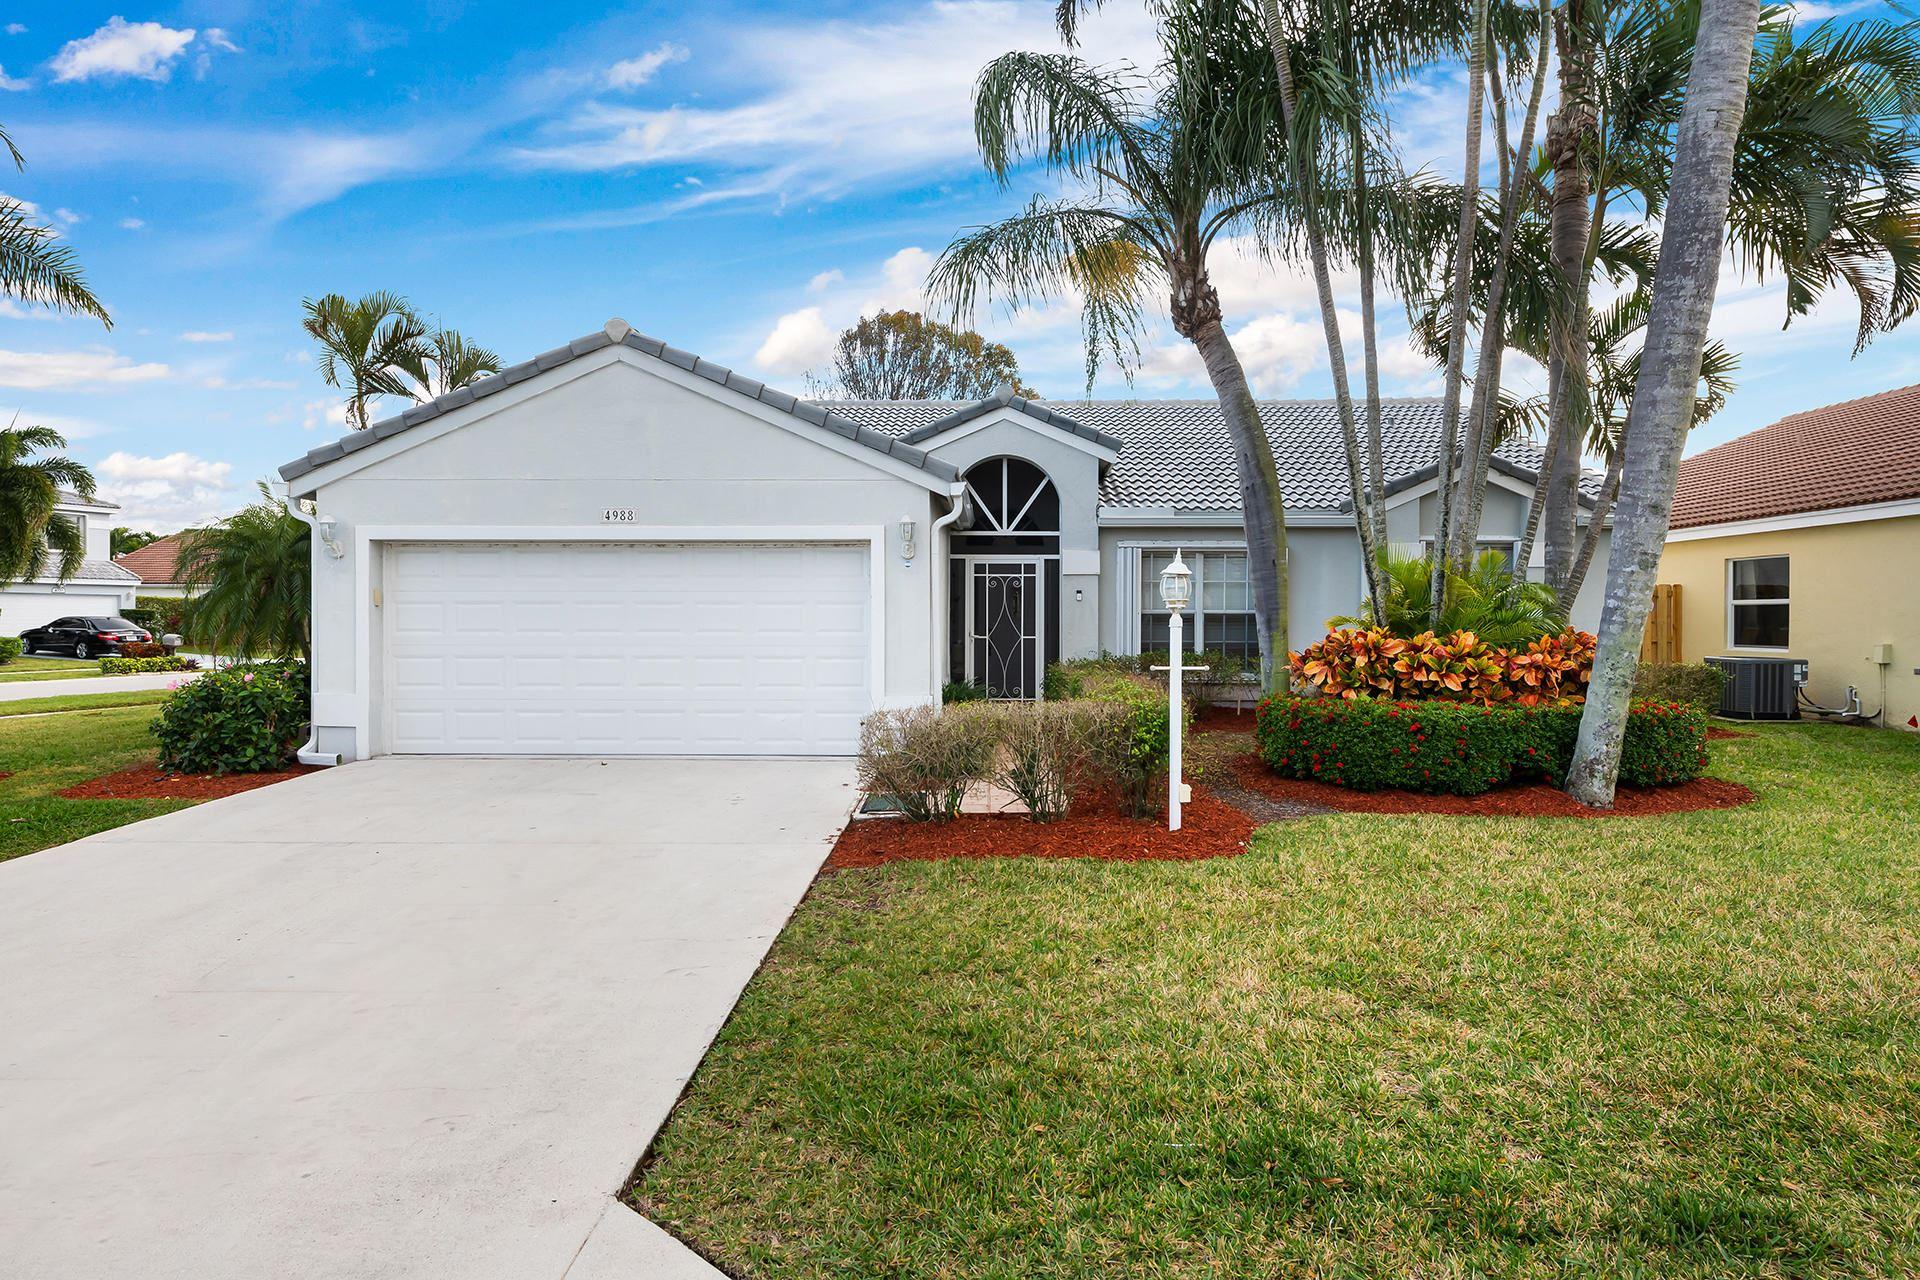 4988 Broadstone Circle, West Palm Beach, FL 33417 - #: RX-10688054